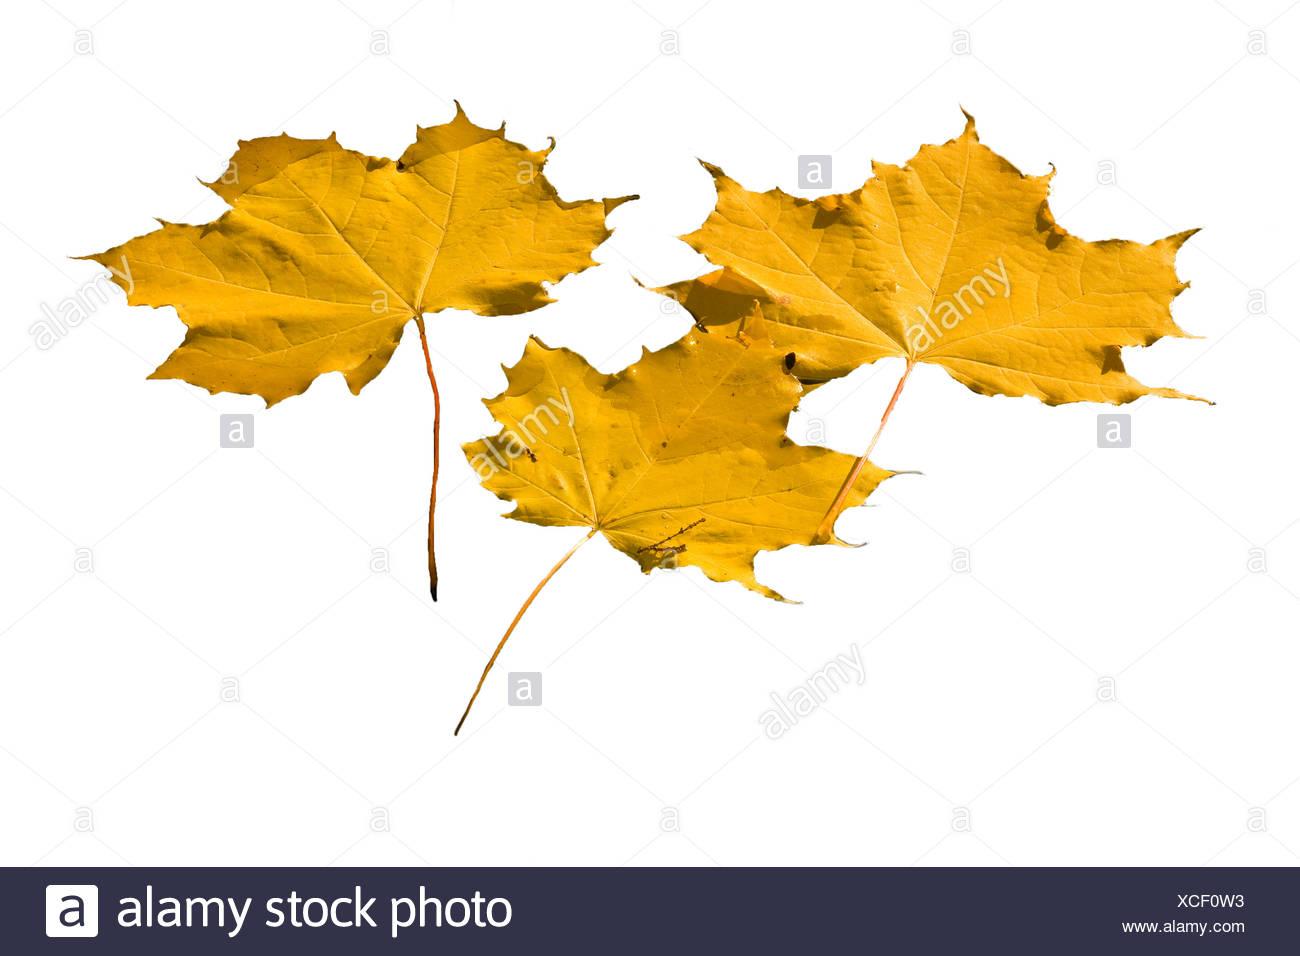 Leaves,Leaf,maple,autumn,water,maple leaf,three,yellow - Stock Image